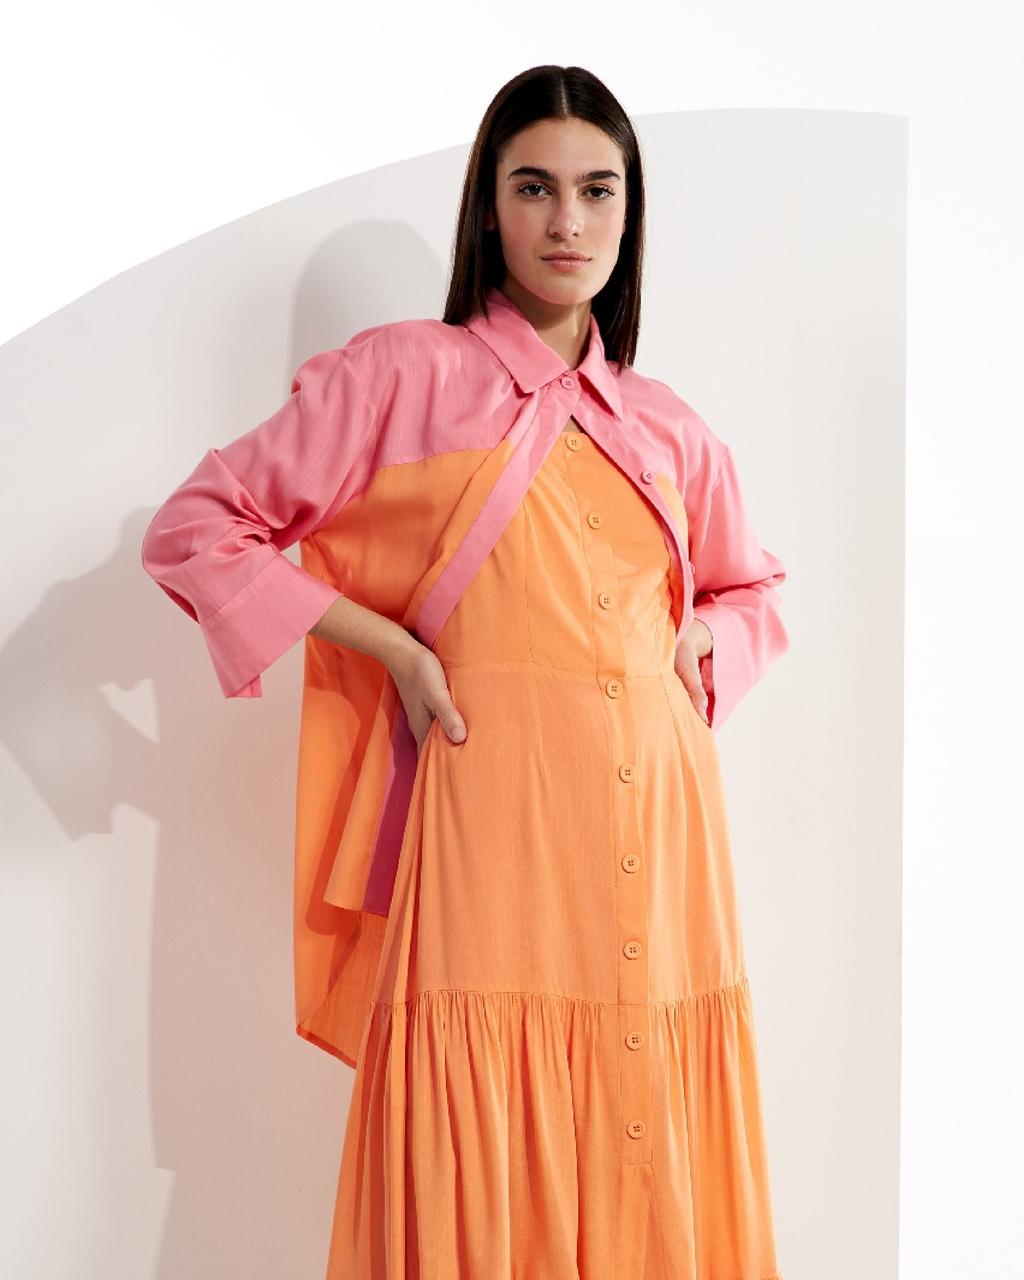 Camisa Alongada Bicolor com Recortes